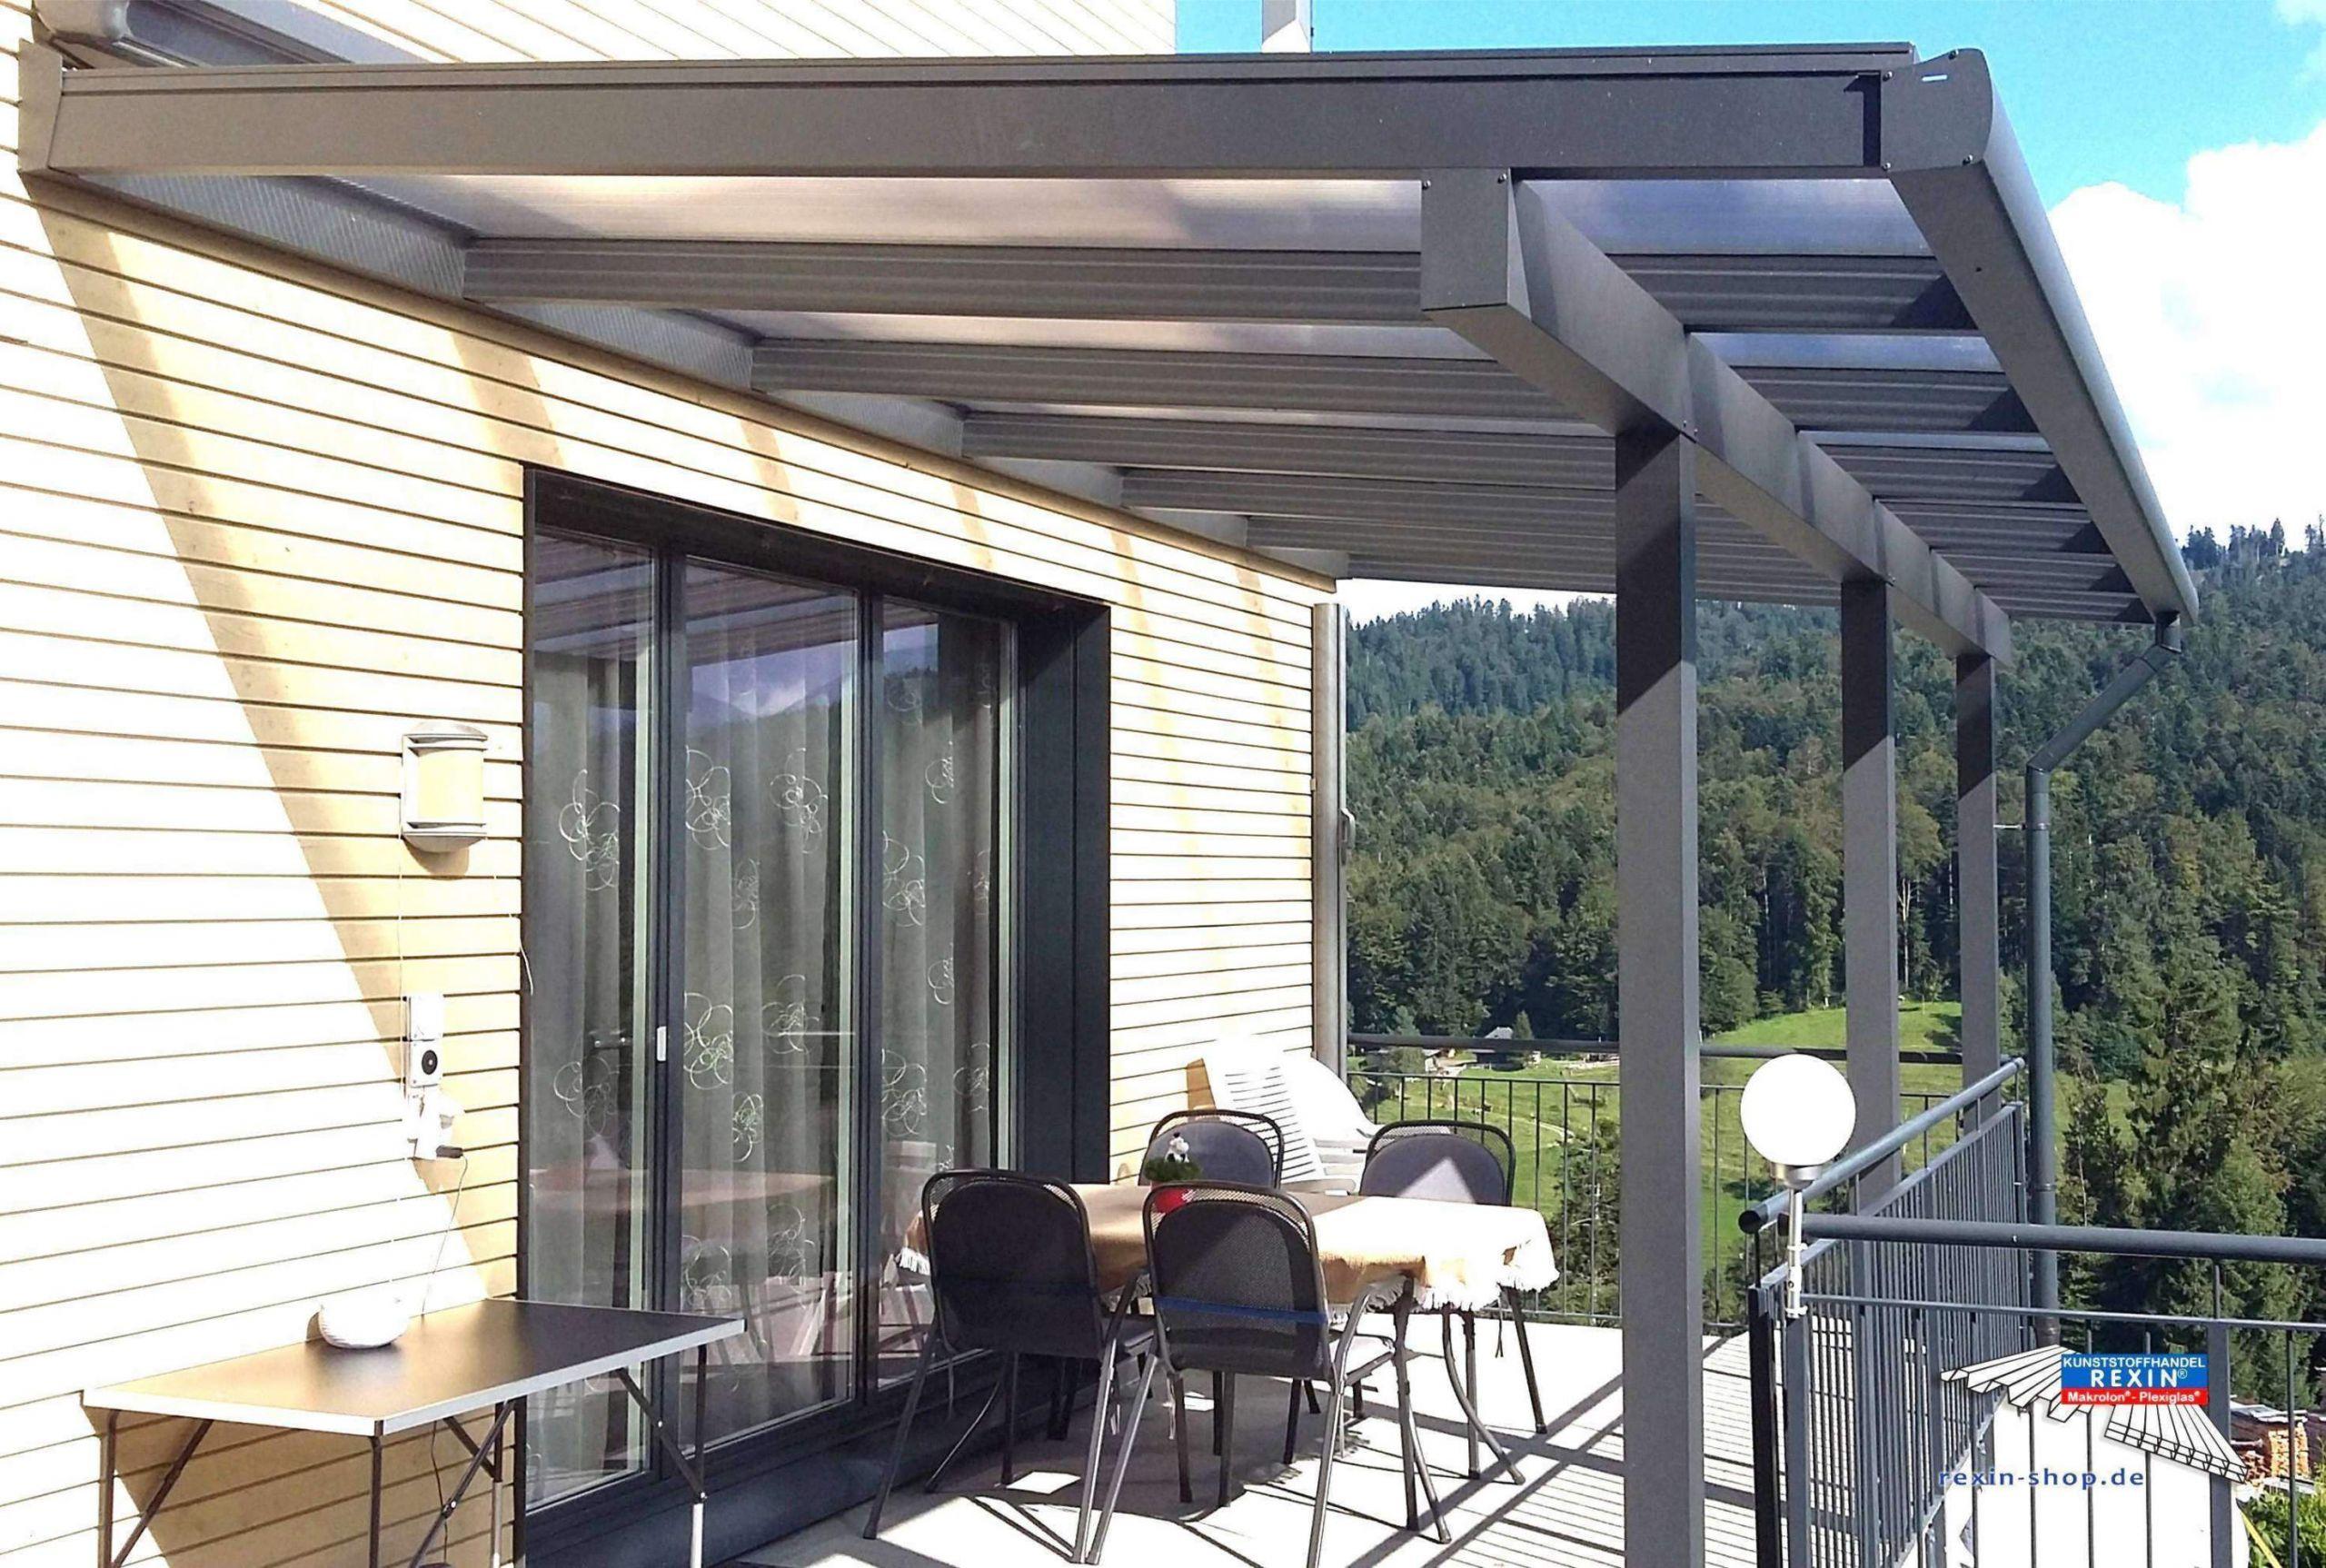 46 neu sonnenrollo fur terrasse pic sonnenschutz garten terrasse sonnenschutz garten terrasse